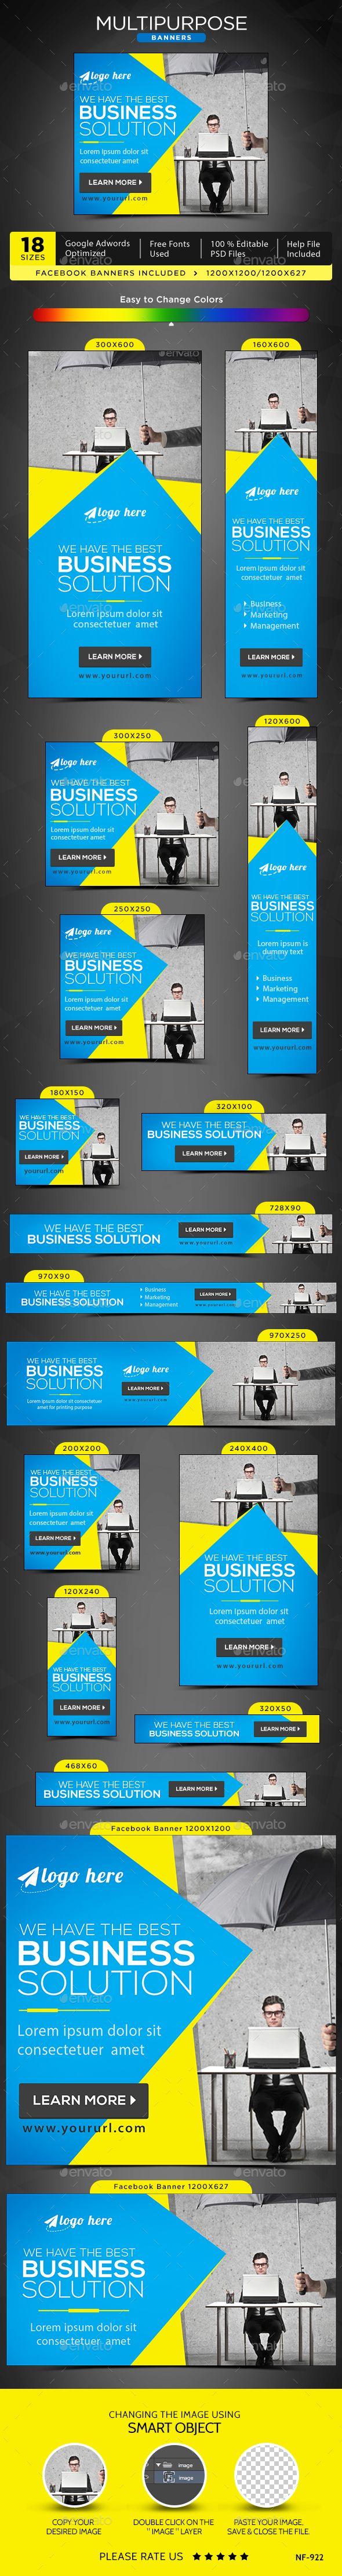 Multipurpose Web Banners Template PSD #design #ad Download: http://graphicriver.net/item/multipurpose-banners/14107093?ref=ksioks